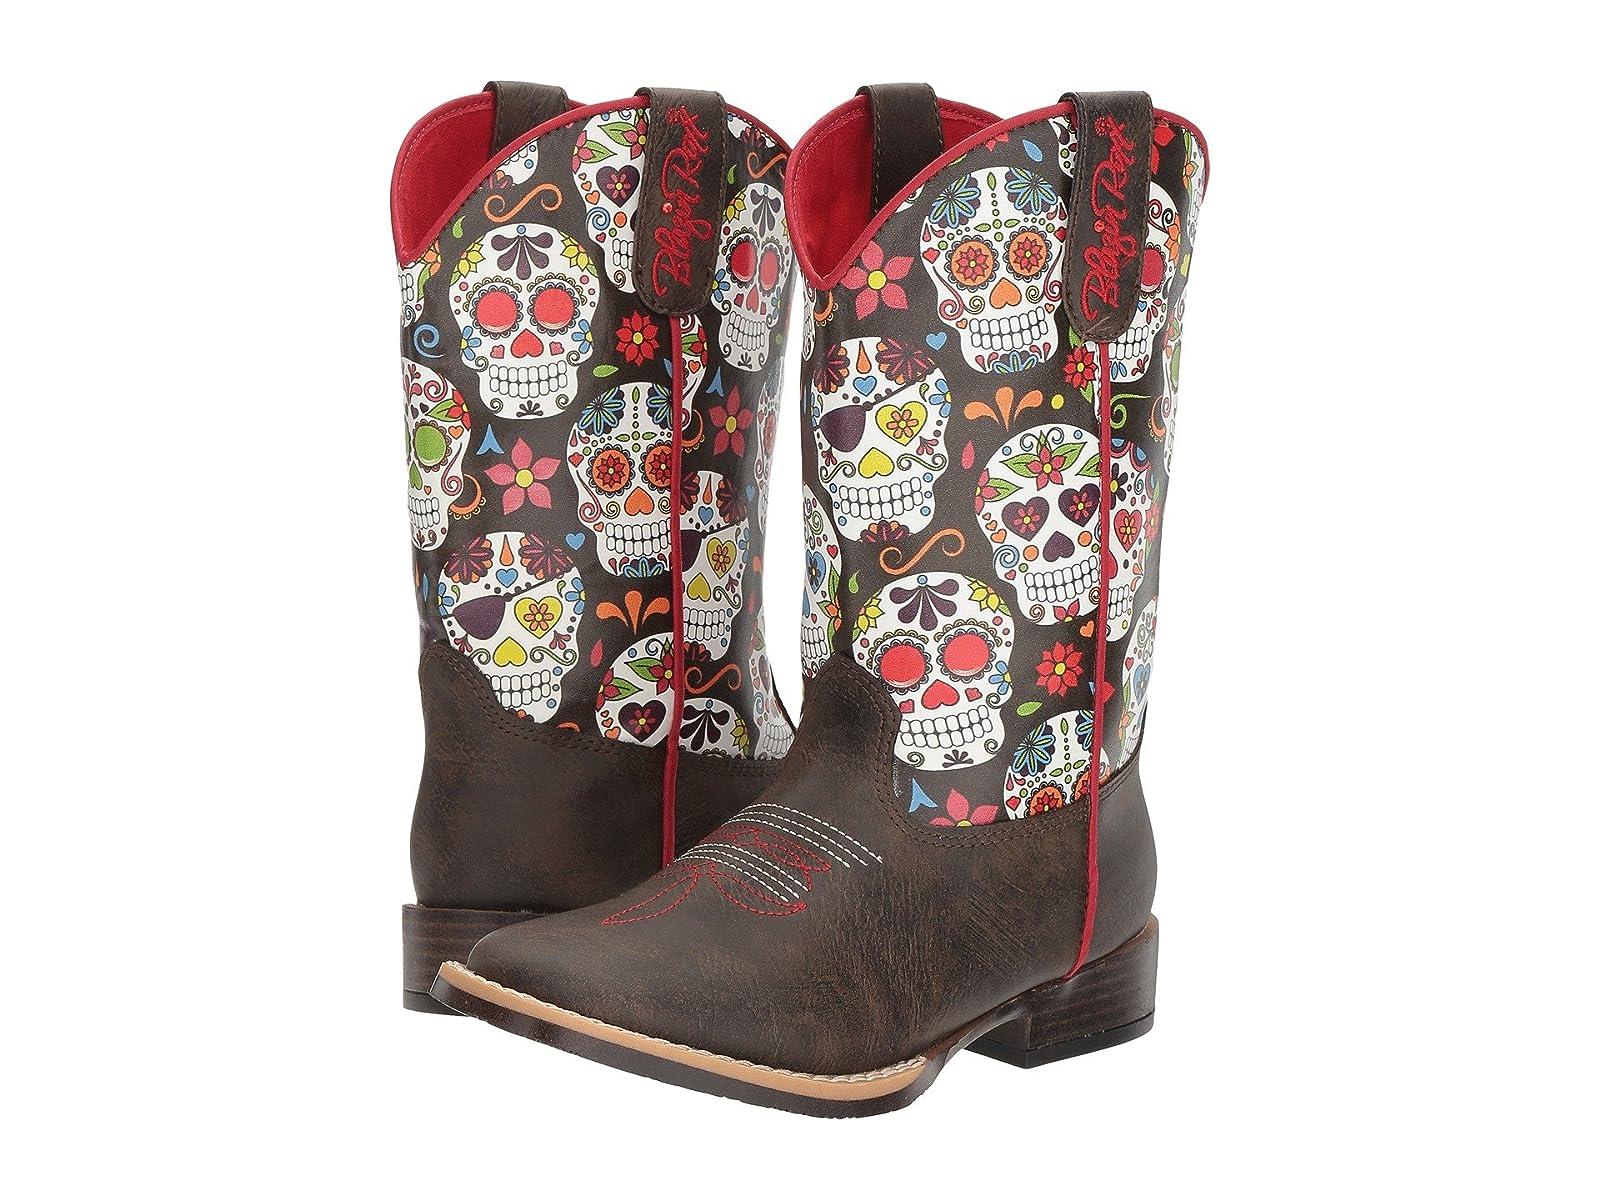 M&F Western Kids Destiny (Toddler/Little Kid)Affordable and distinctive shoes